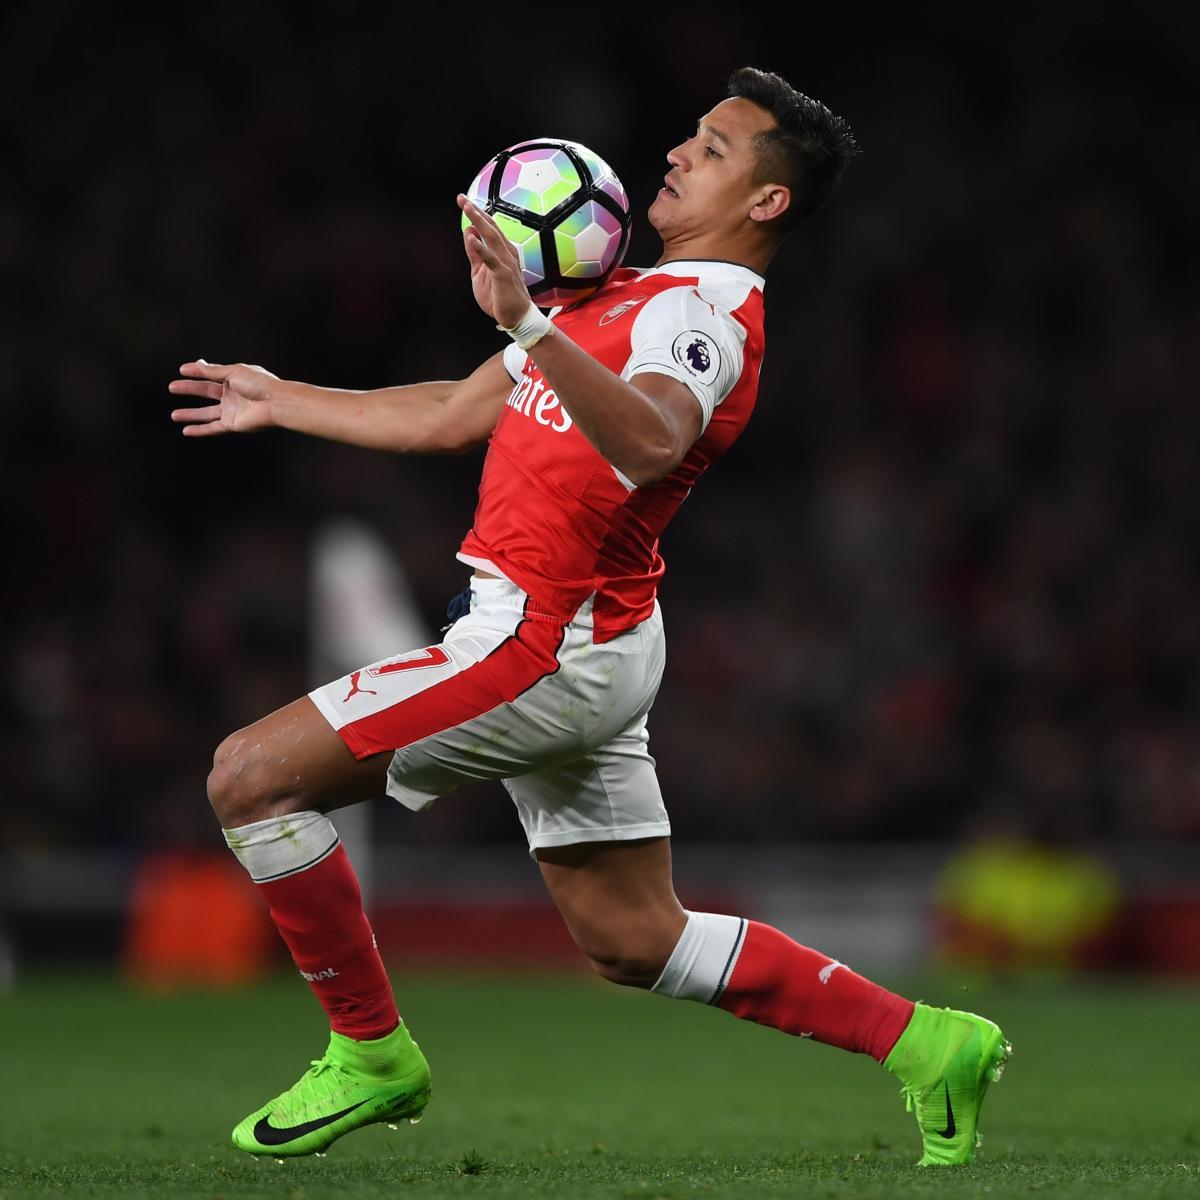 Manchester United Transfer News Alexis Sanchez Rumours: Arsenal Transfer News: Fresh Alexis Sanchez Rumours, Mesut